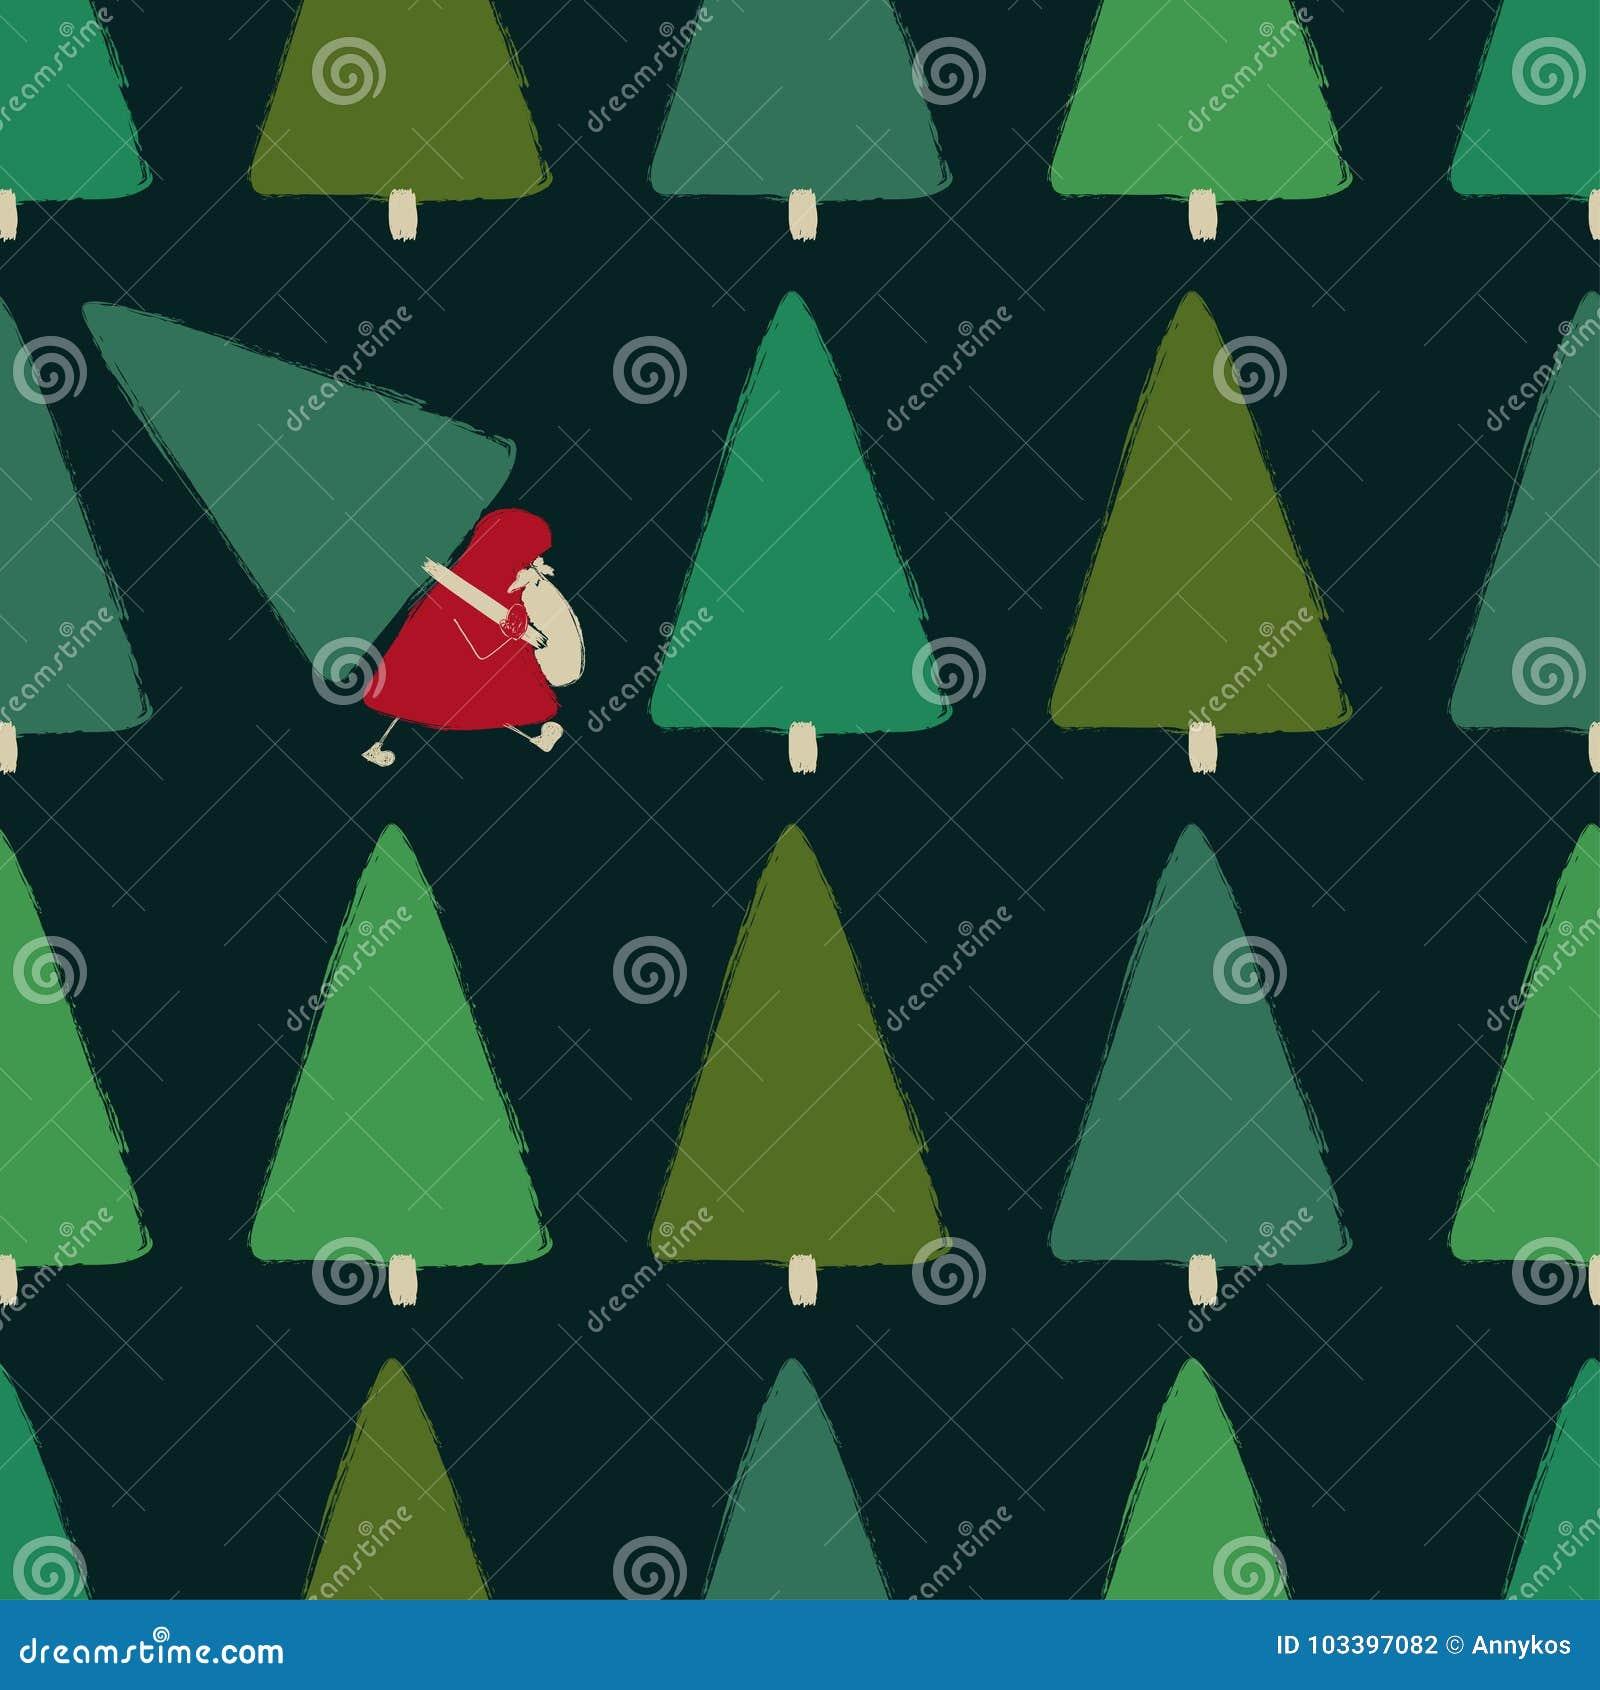 Santa Stealing Christmas Tree Seamless Pattern.